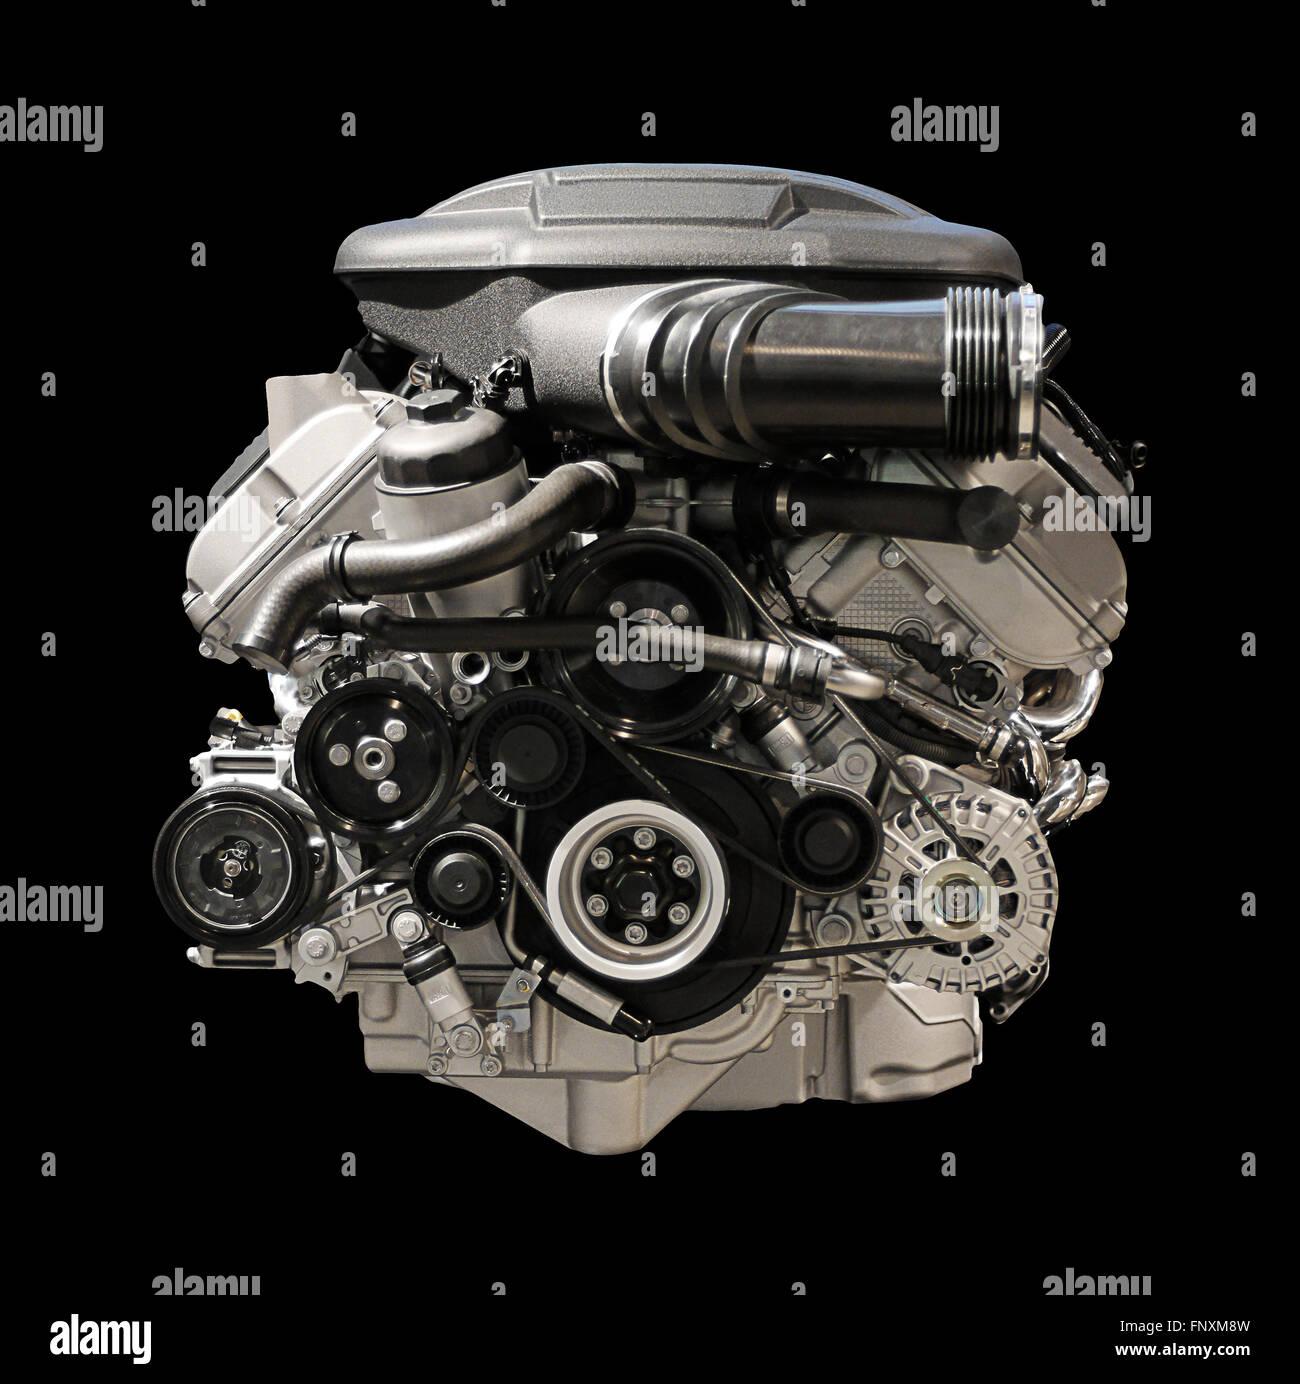 Black and white photo of internal combustion engine isolated on black background Stock Photo